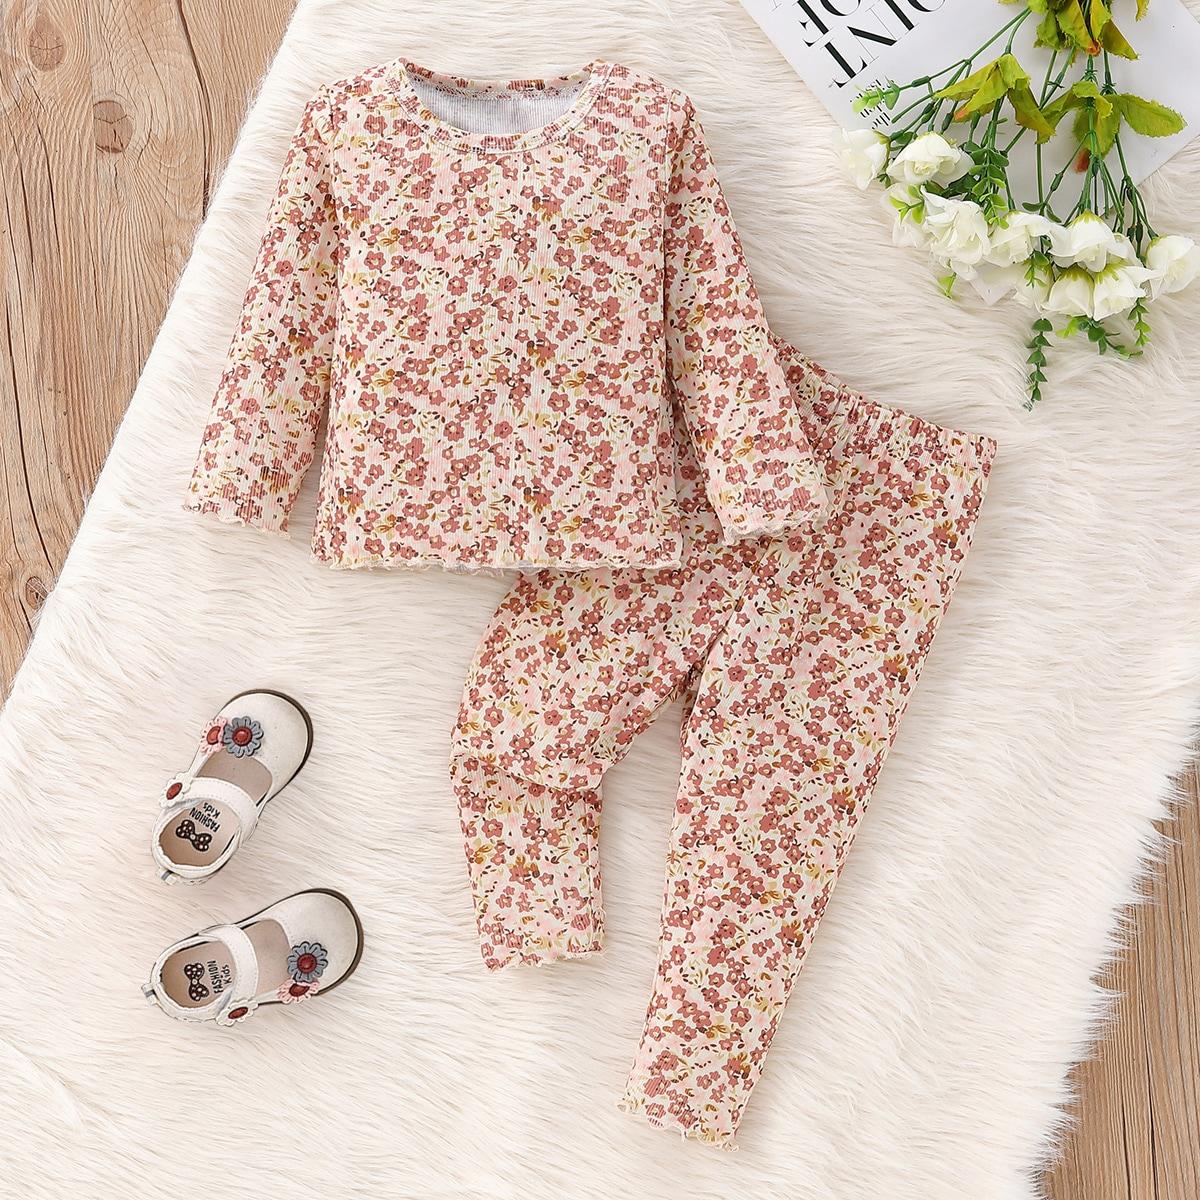 Baby Ditsy Floral Print Lettuce Trim Top & Leggings